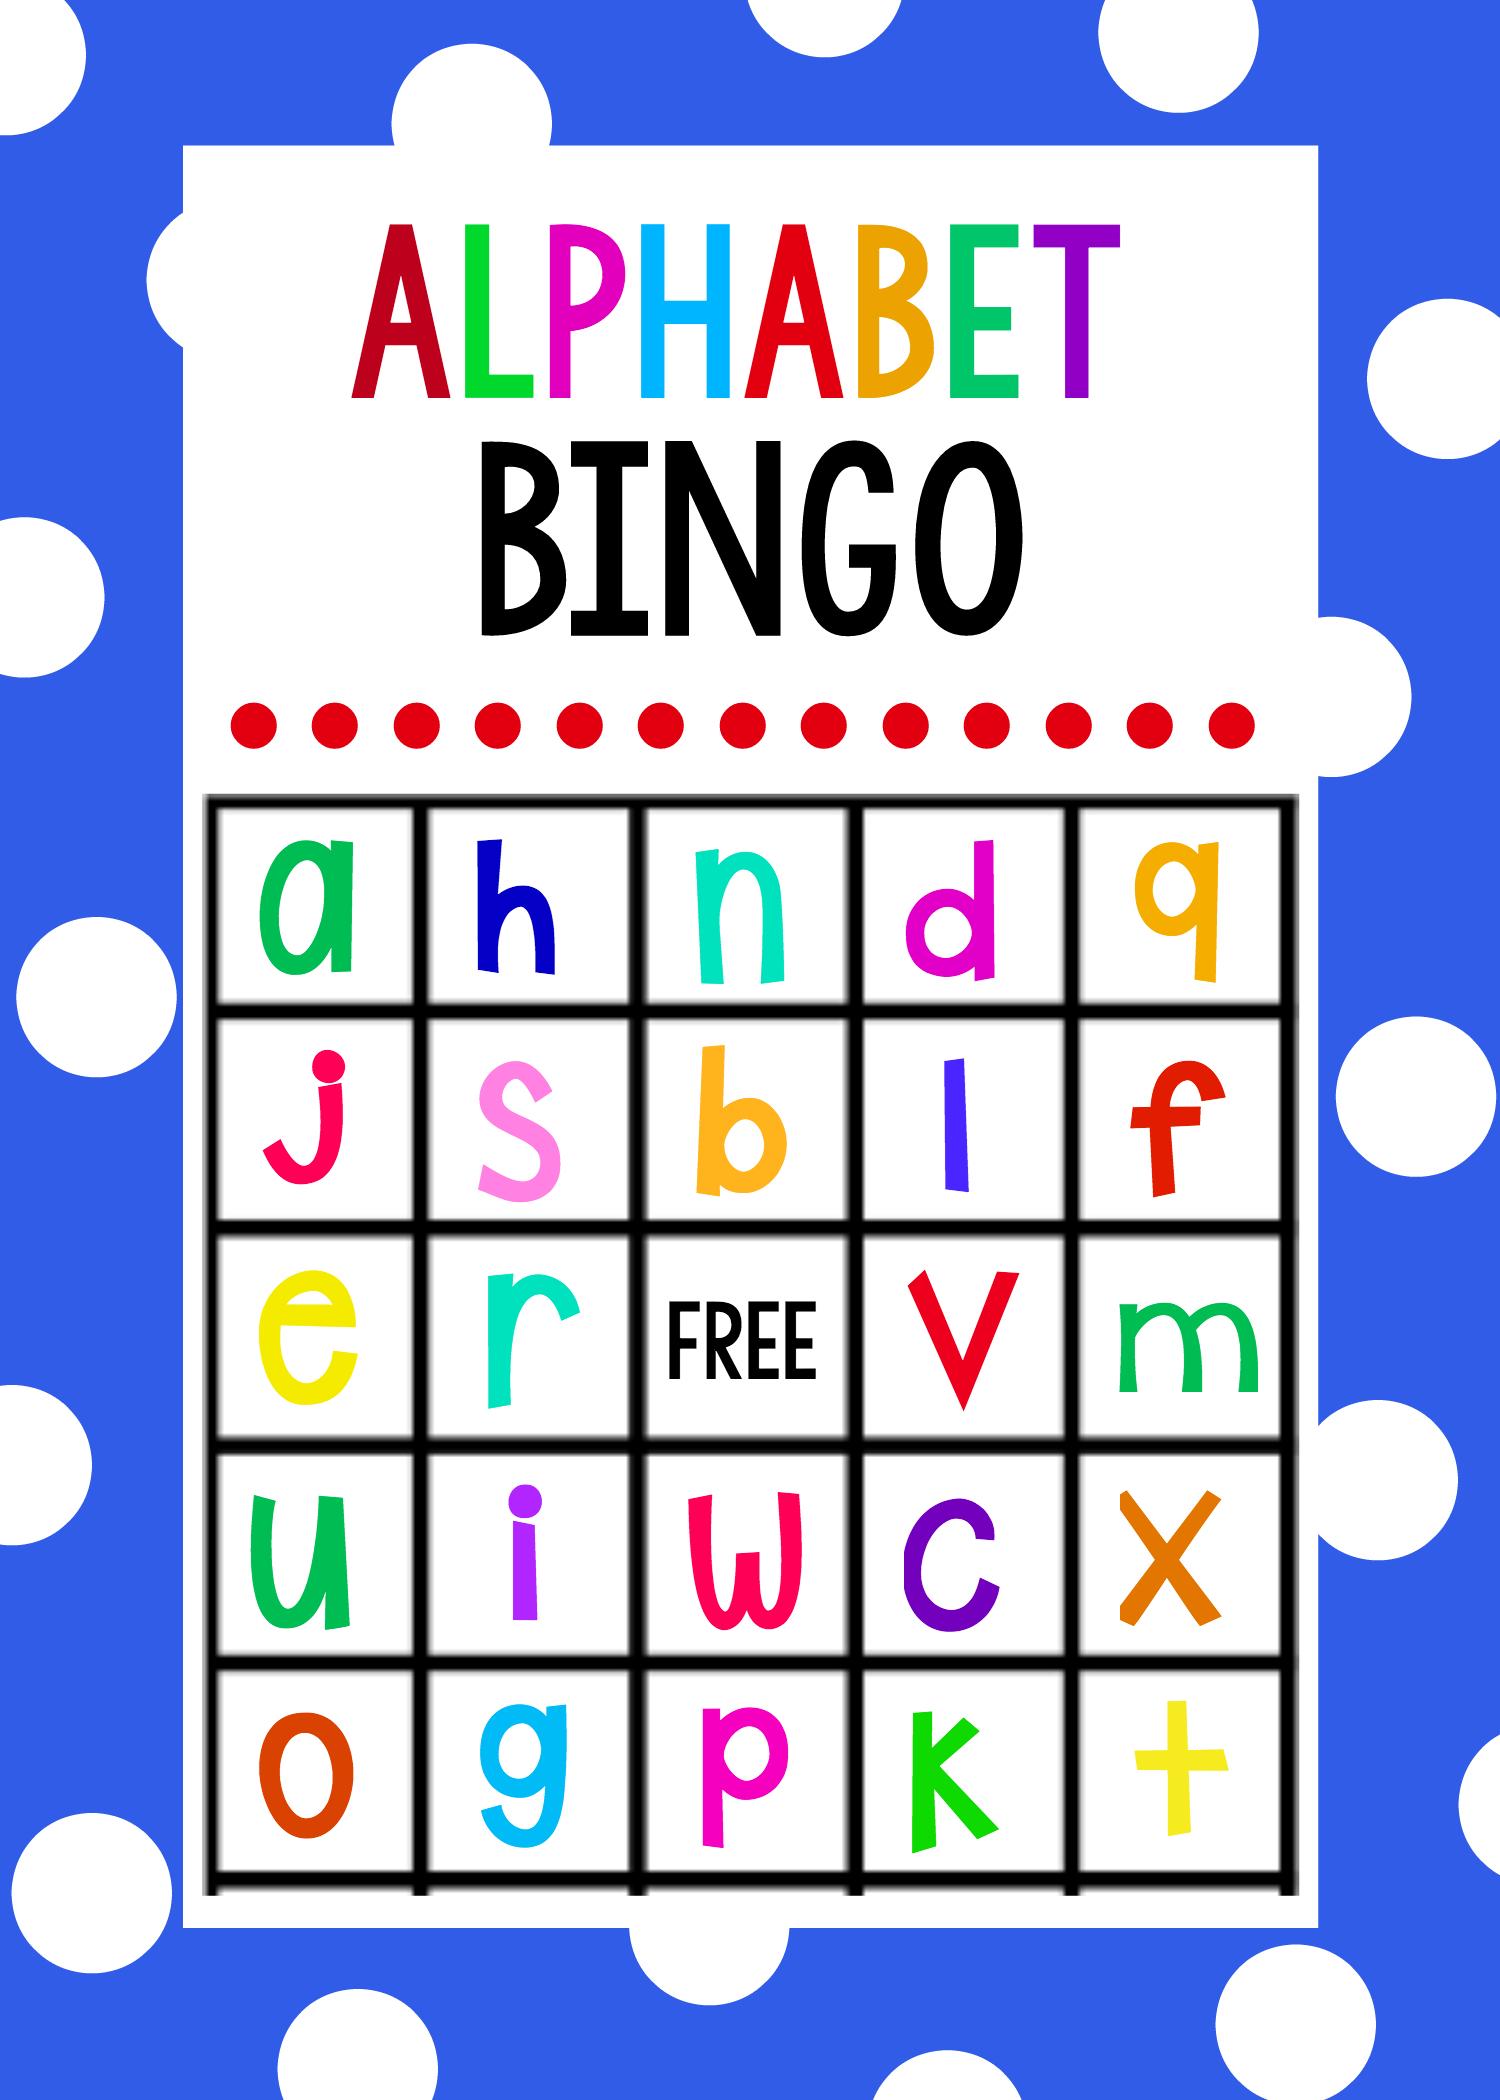 Lowercase Alphabet Bingo Game | Alphabet Games For